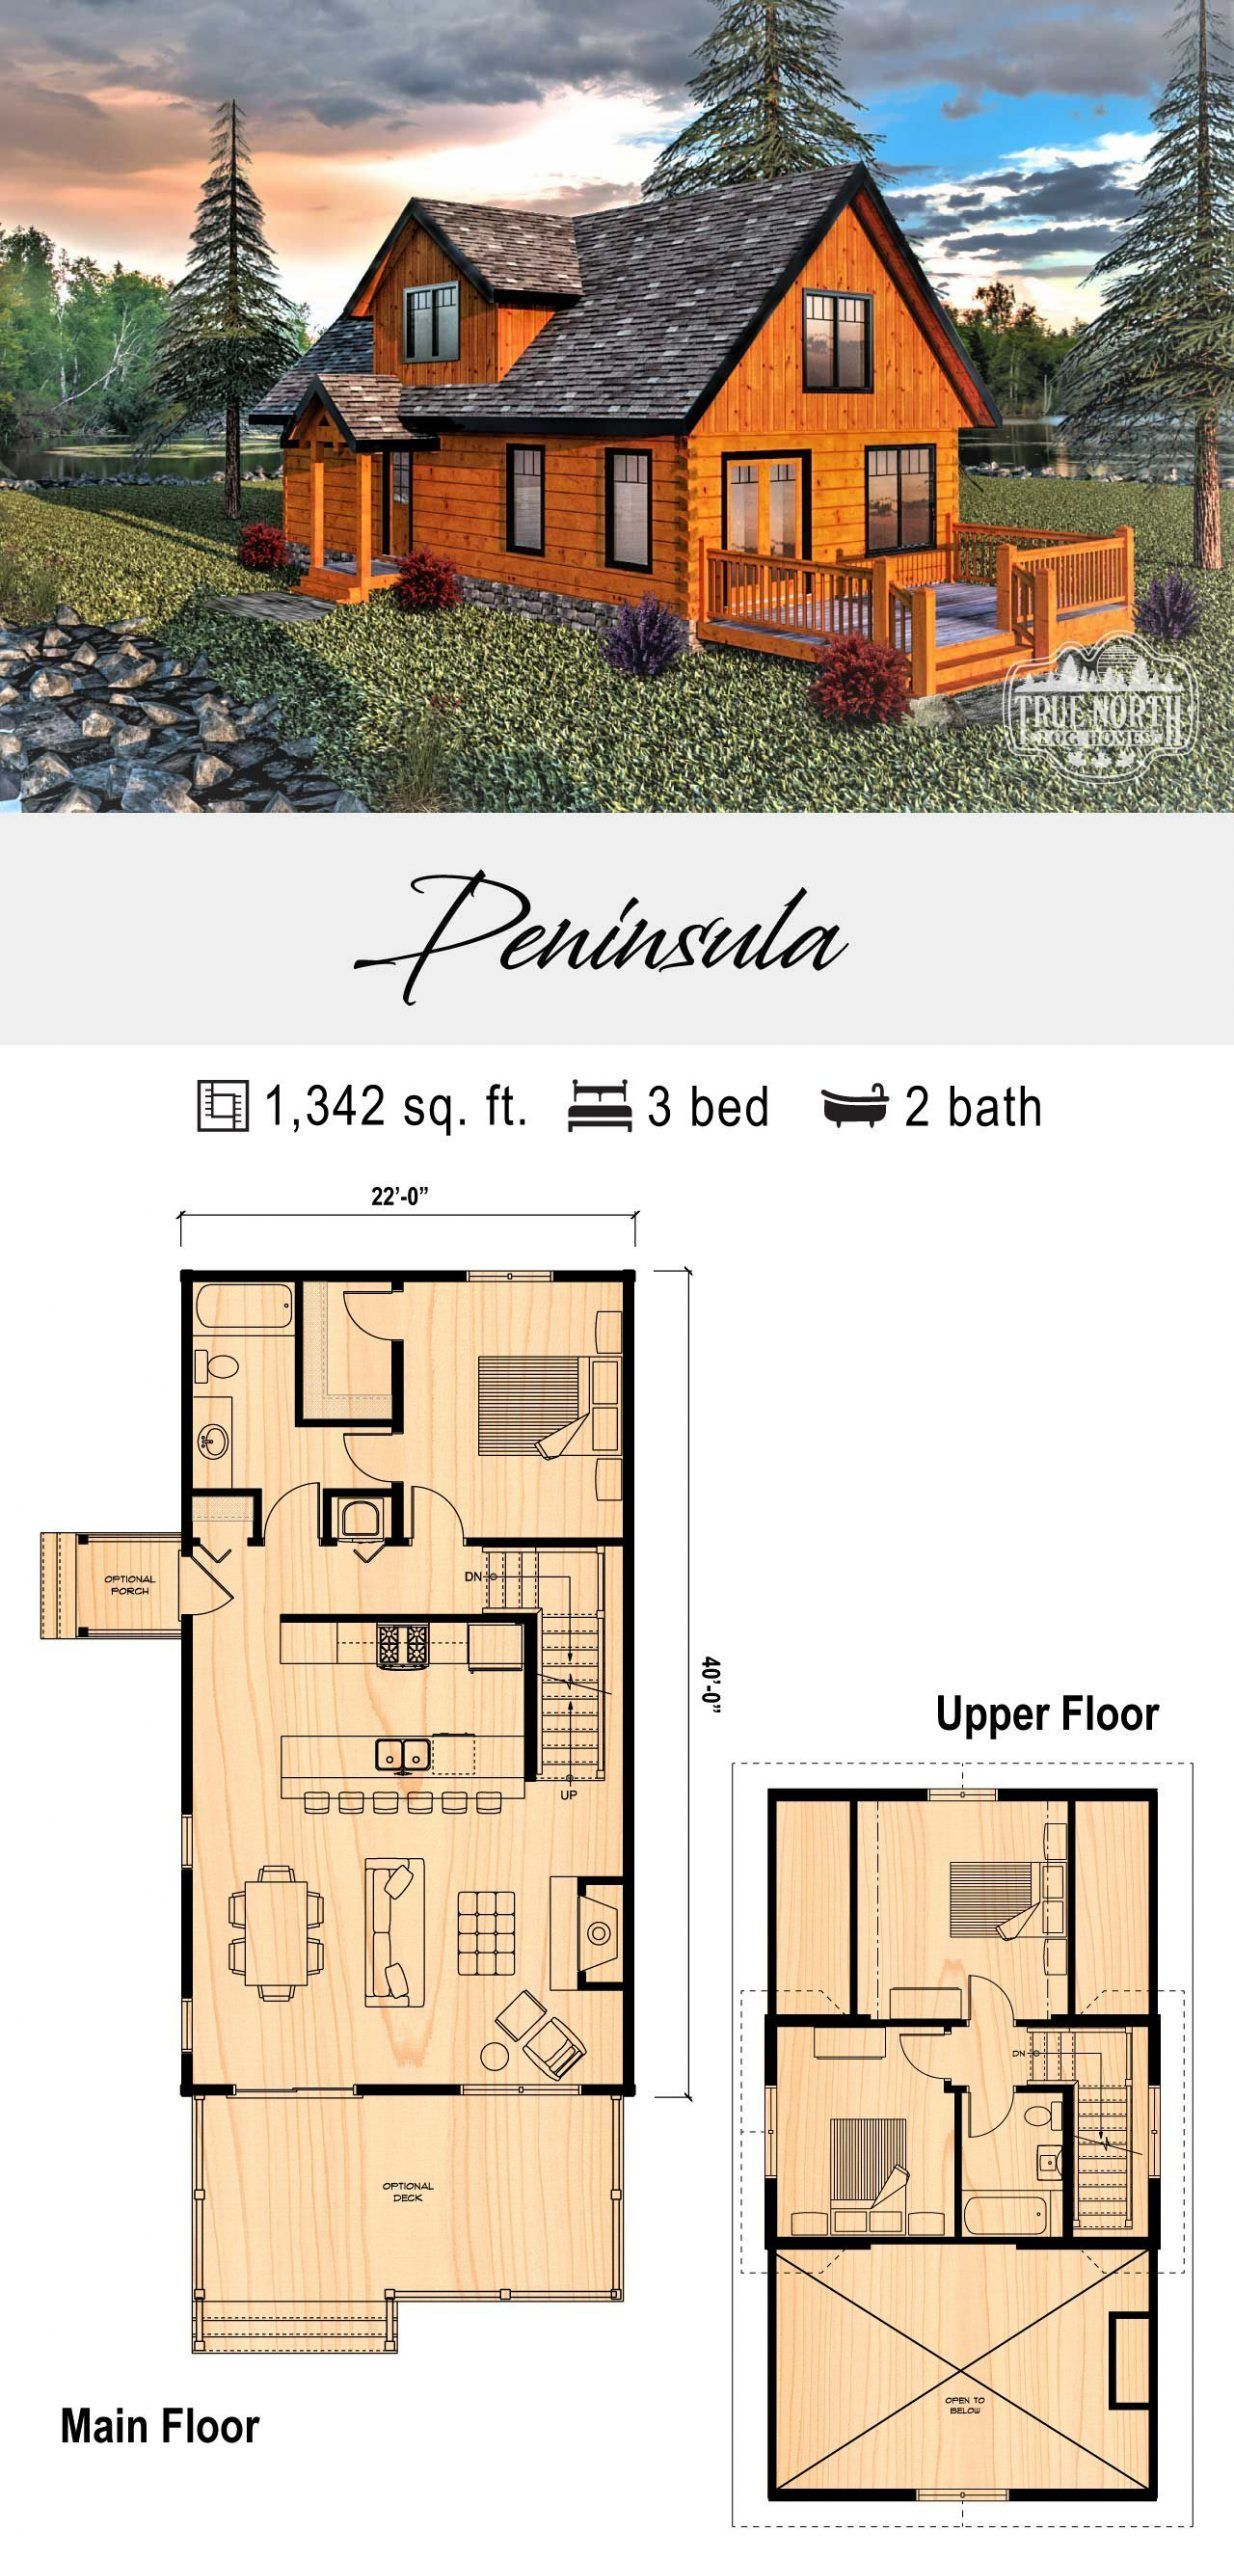 Peninsula True North Log Homes Homes Log North Peninsula True Sims House Plans Cabin House Plans Cottage House Plans